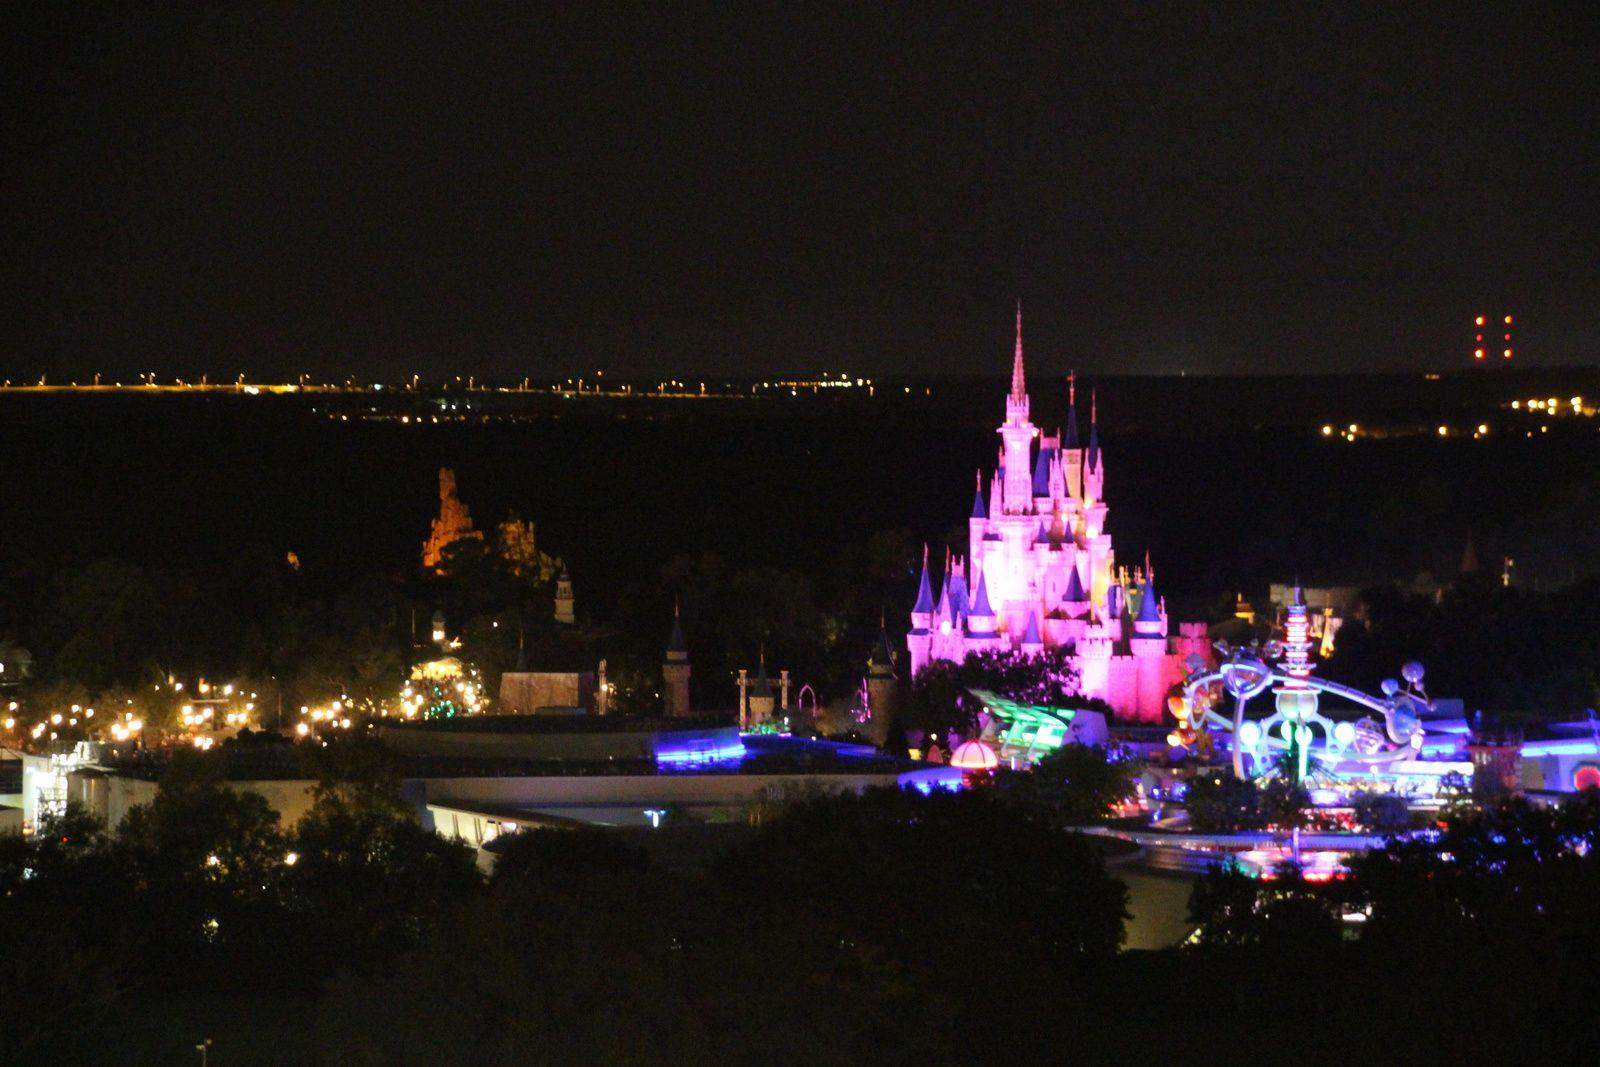 L'hôtel Disney's Contemporary Resort et son restaurant le California Grill